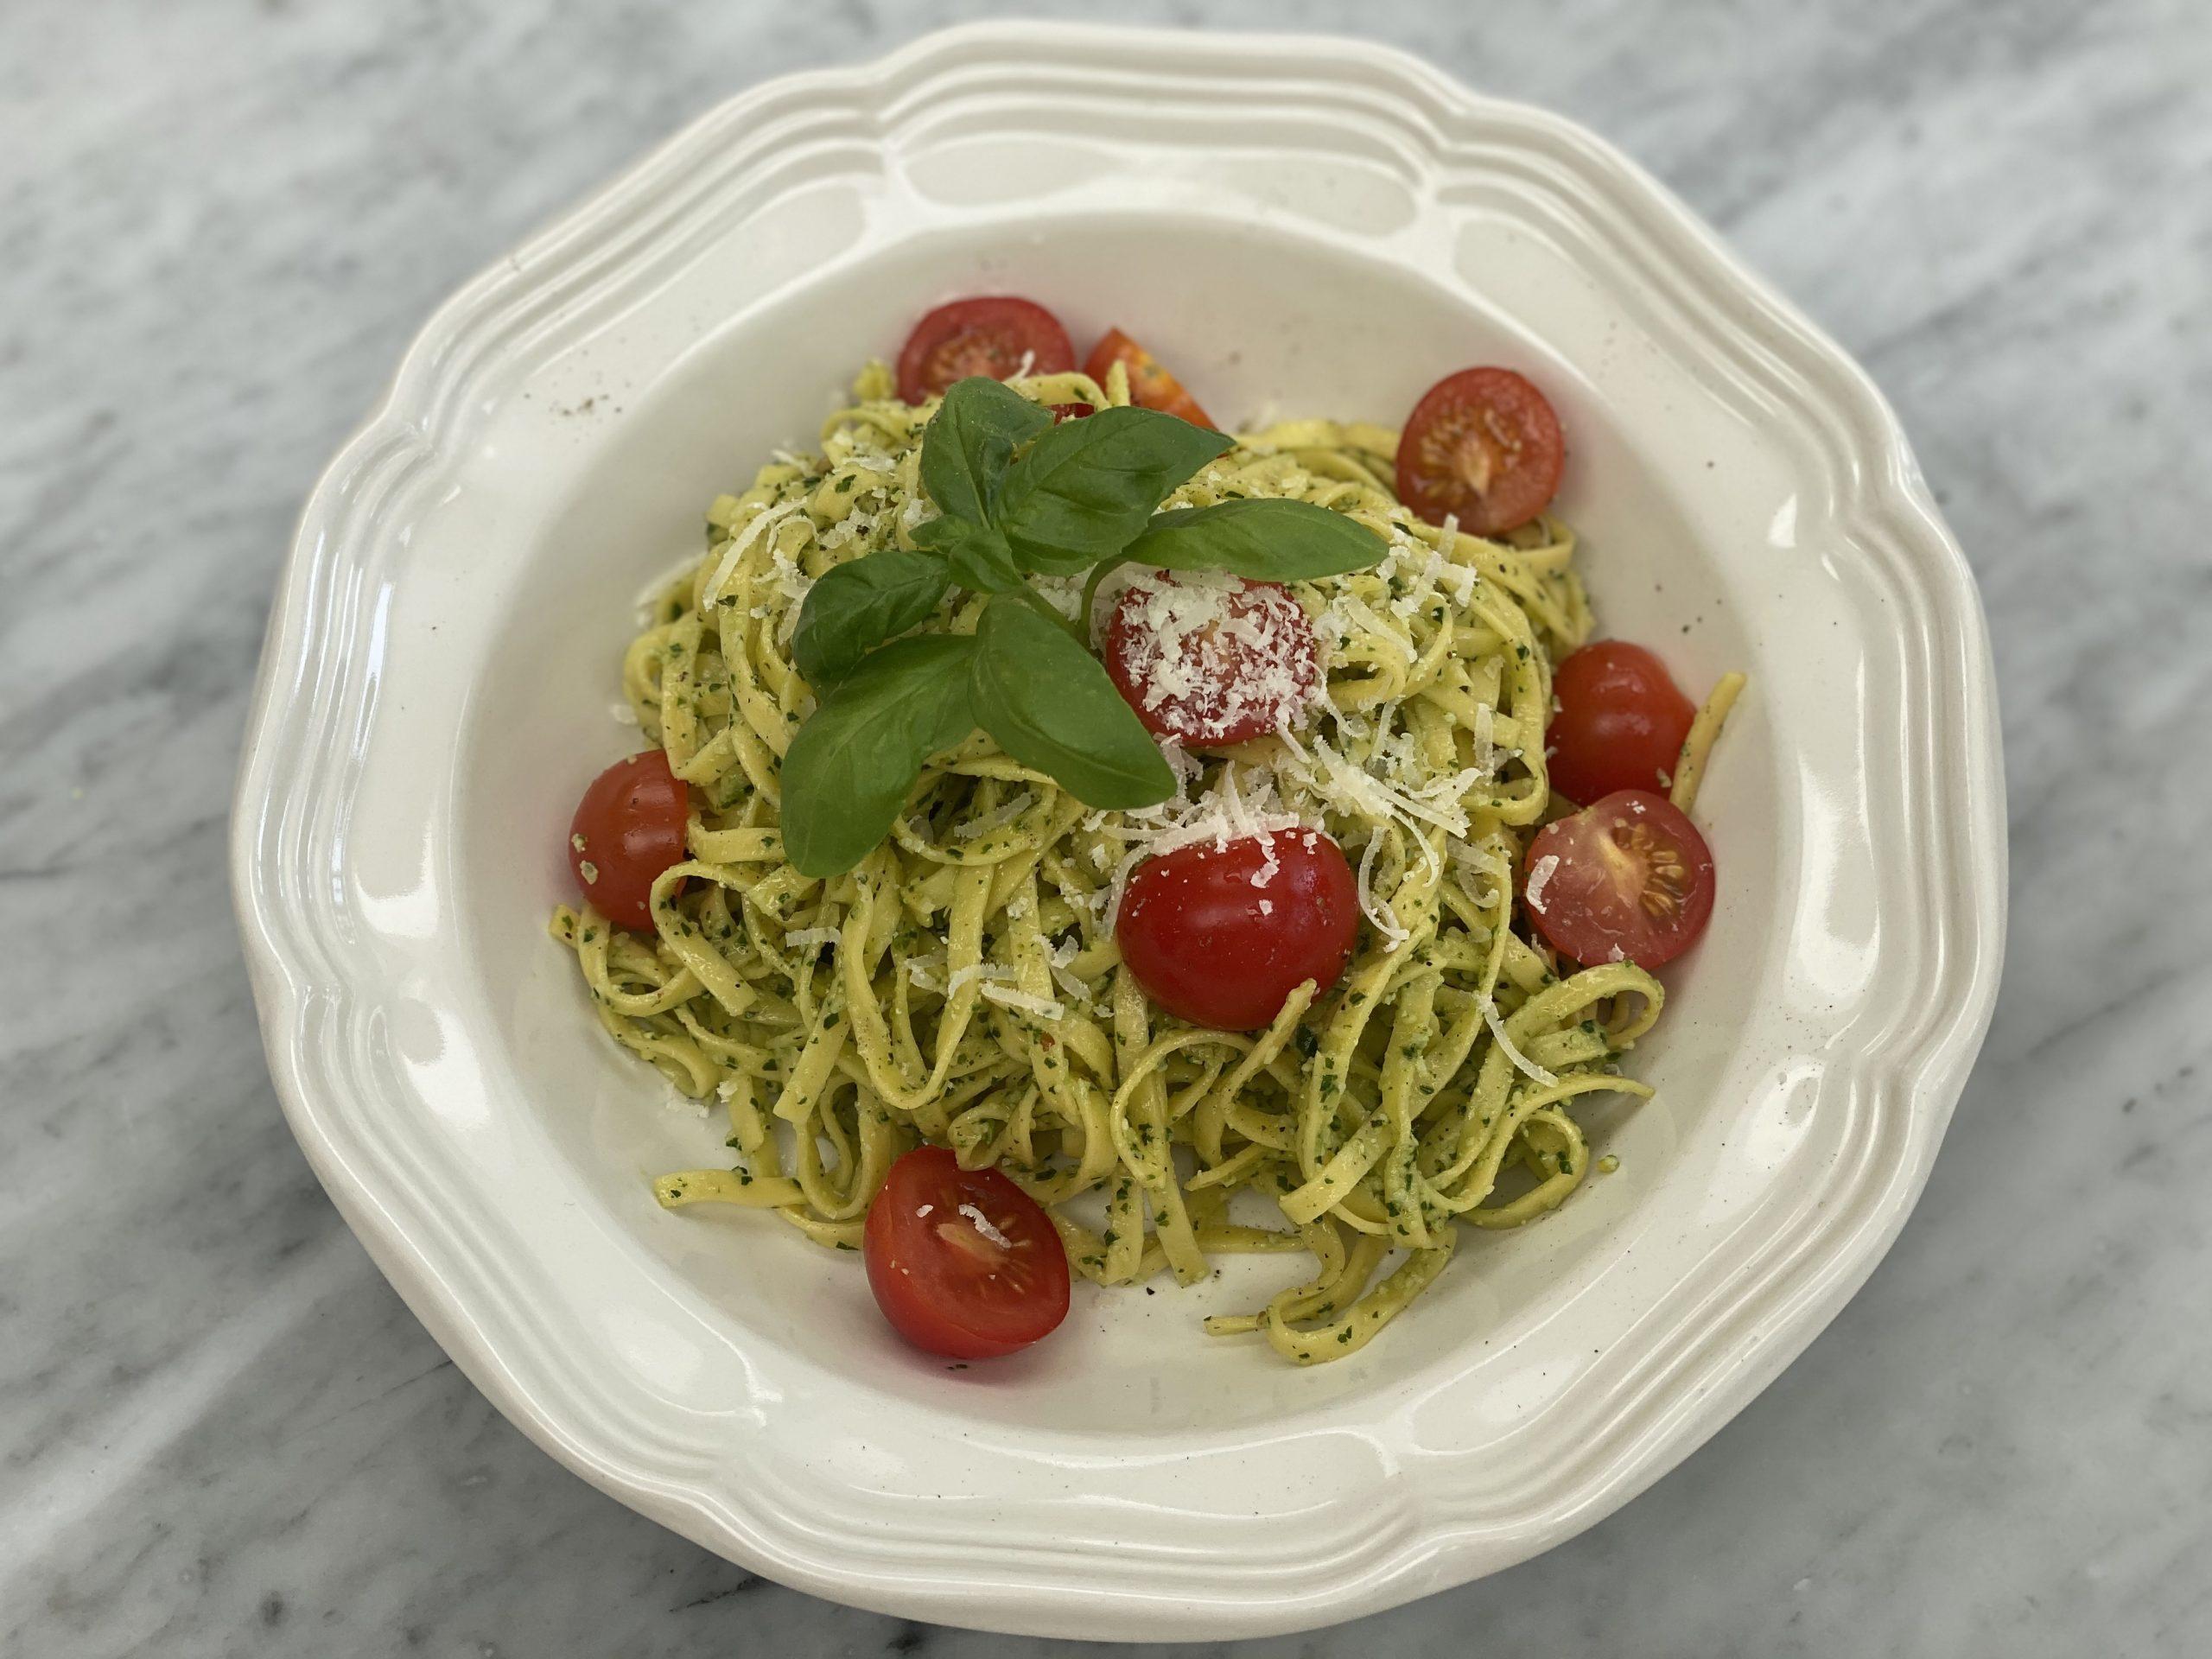 Spinach, Basil & Lemon Pesto Pasta with a glass of Italian Gavi wine